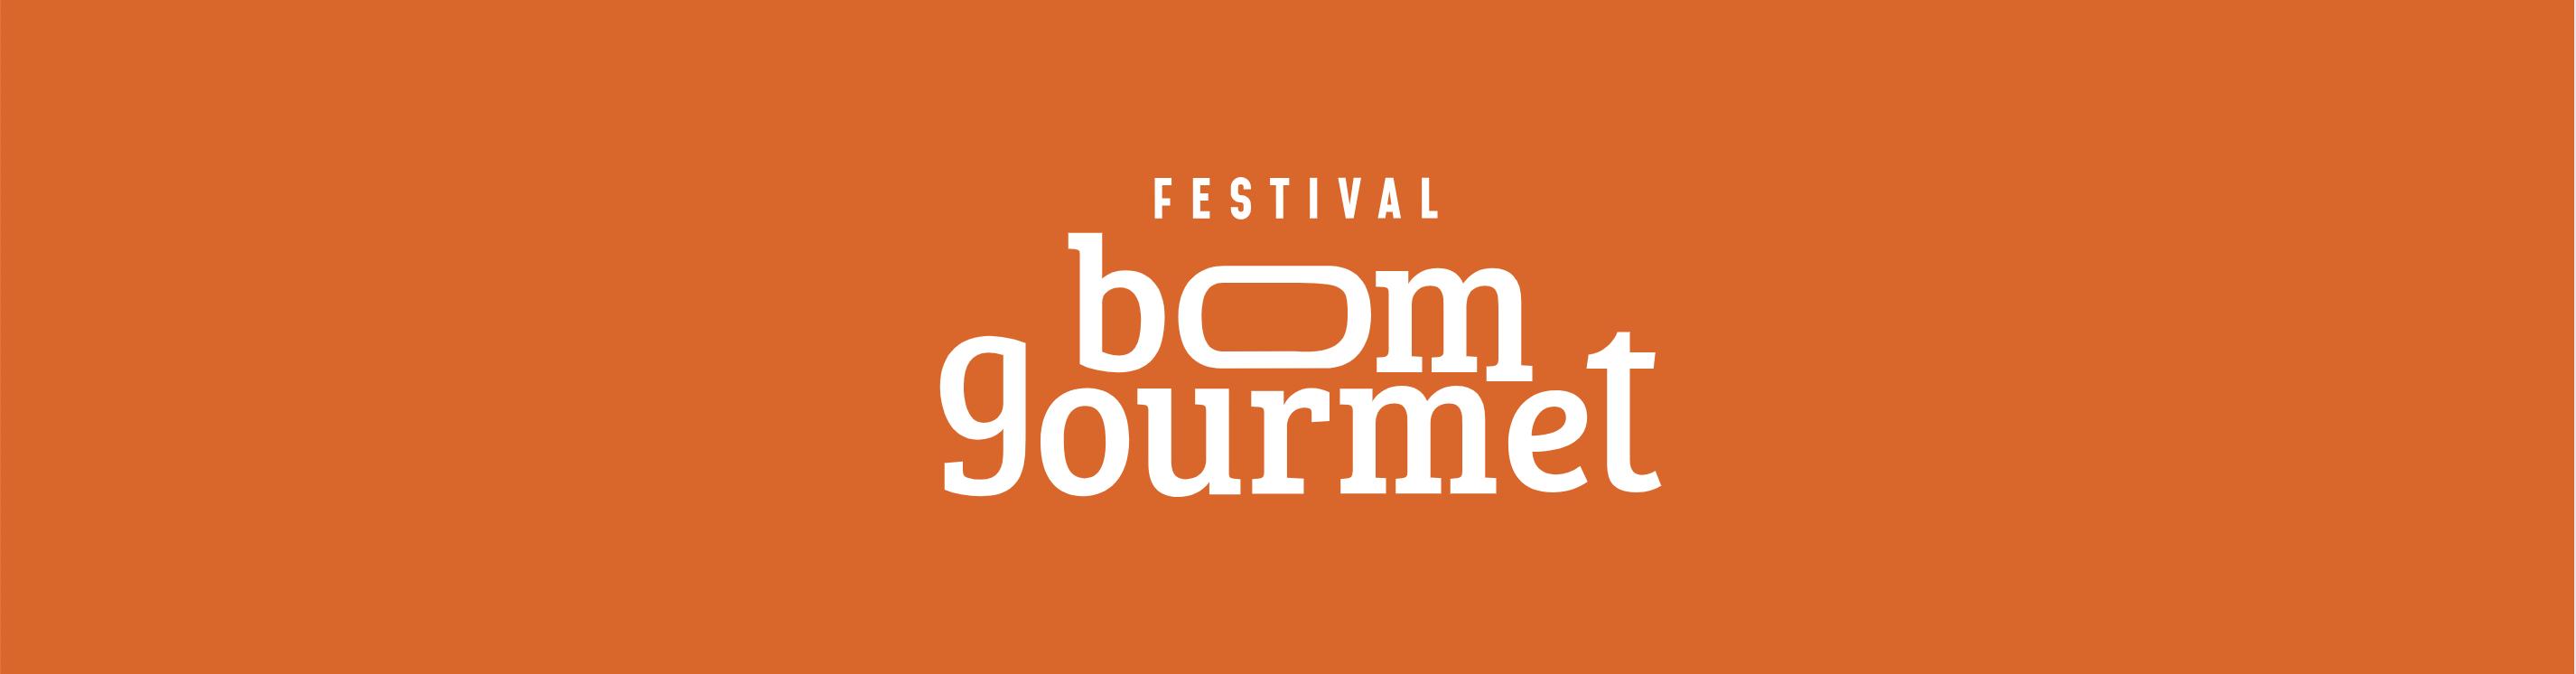 Bom Gourmet Curitiba 2021